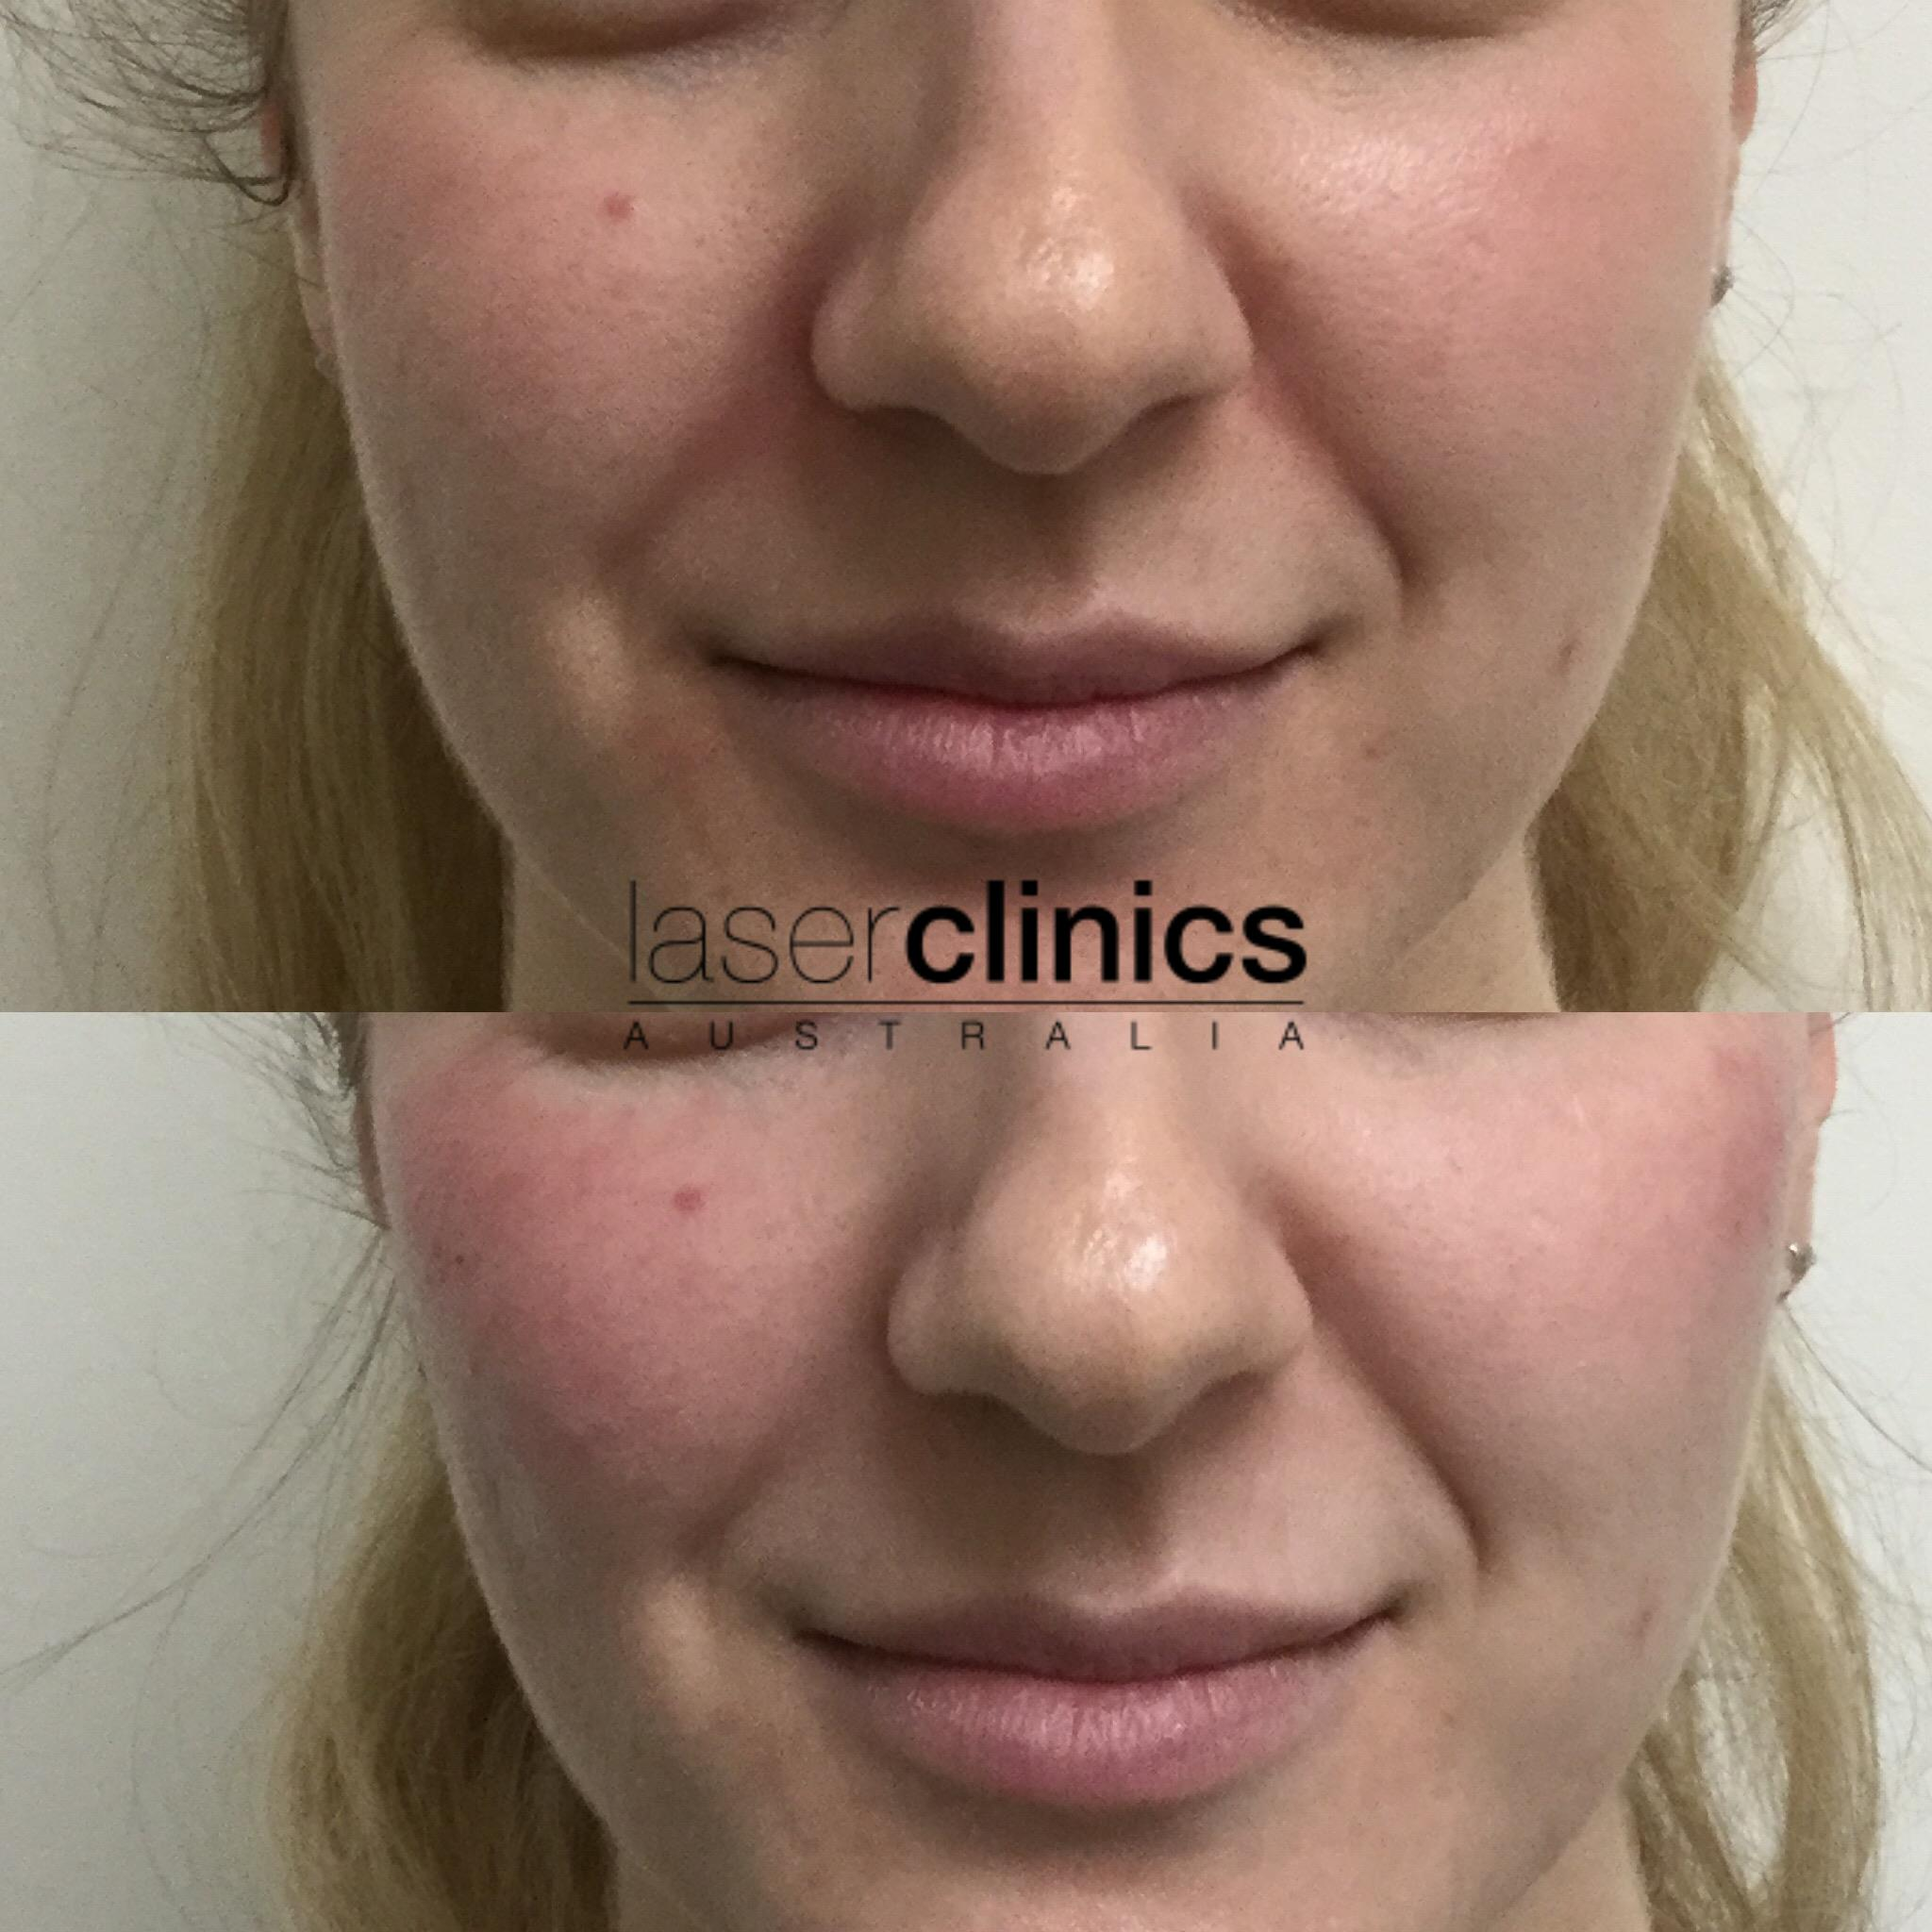 Epping | Laser Clinics Australia